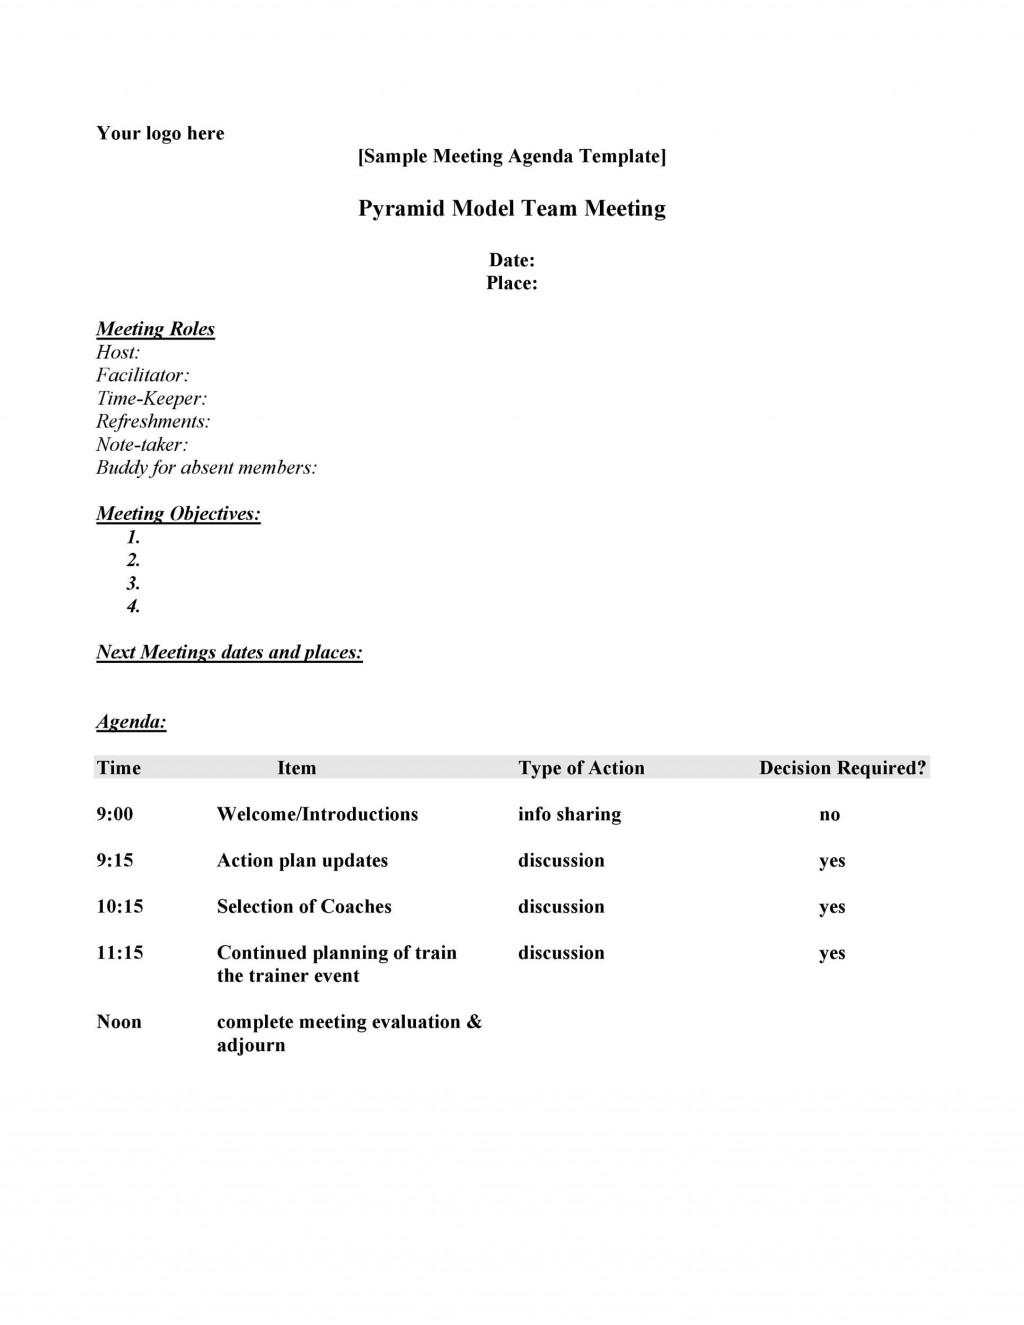 005 Fascinating Staff Meeting Agenda Template Photo  Example Pdf Sample FormatLarge